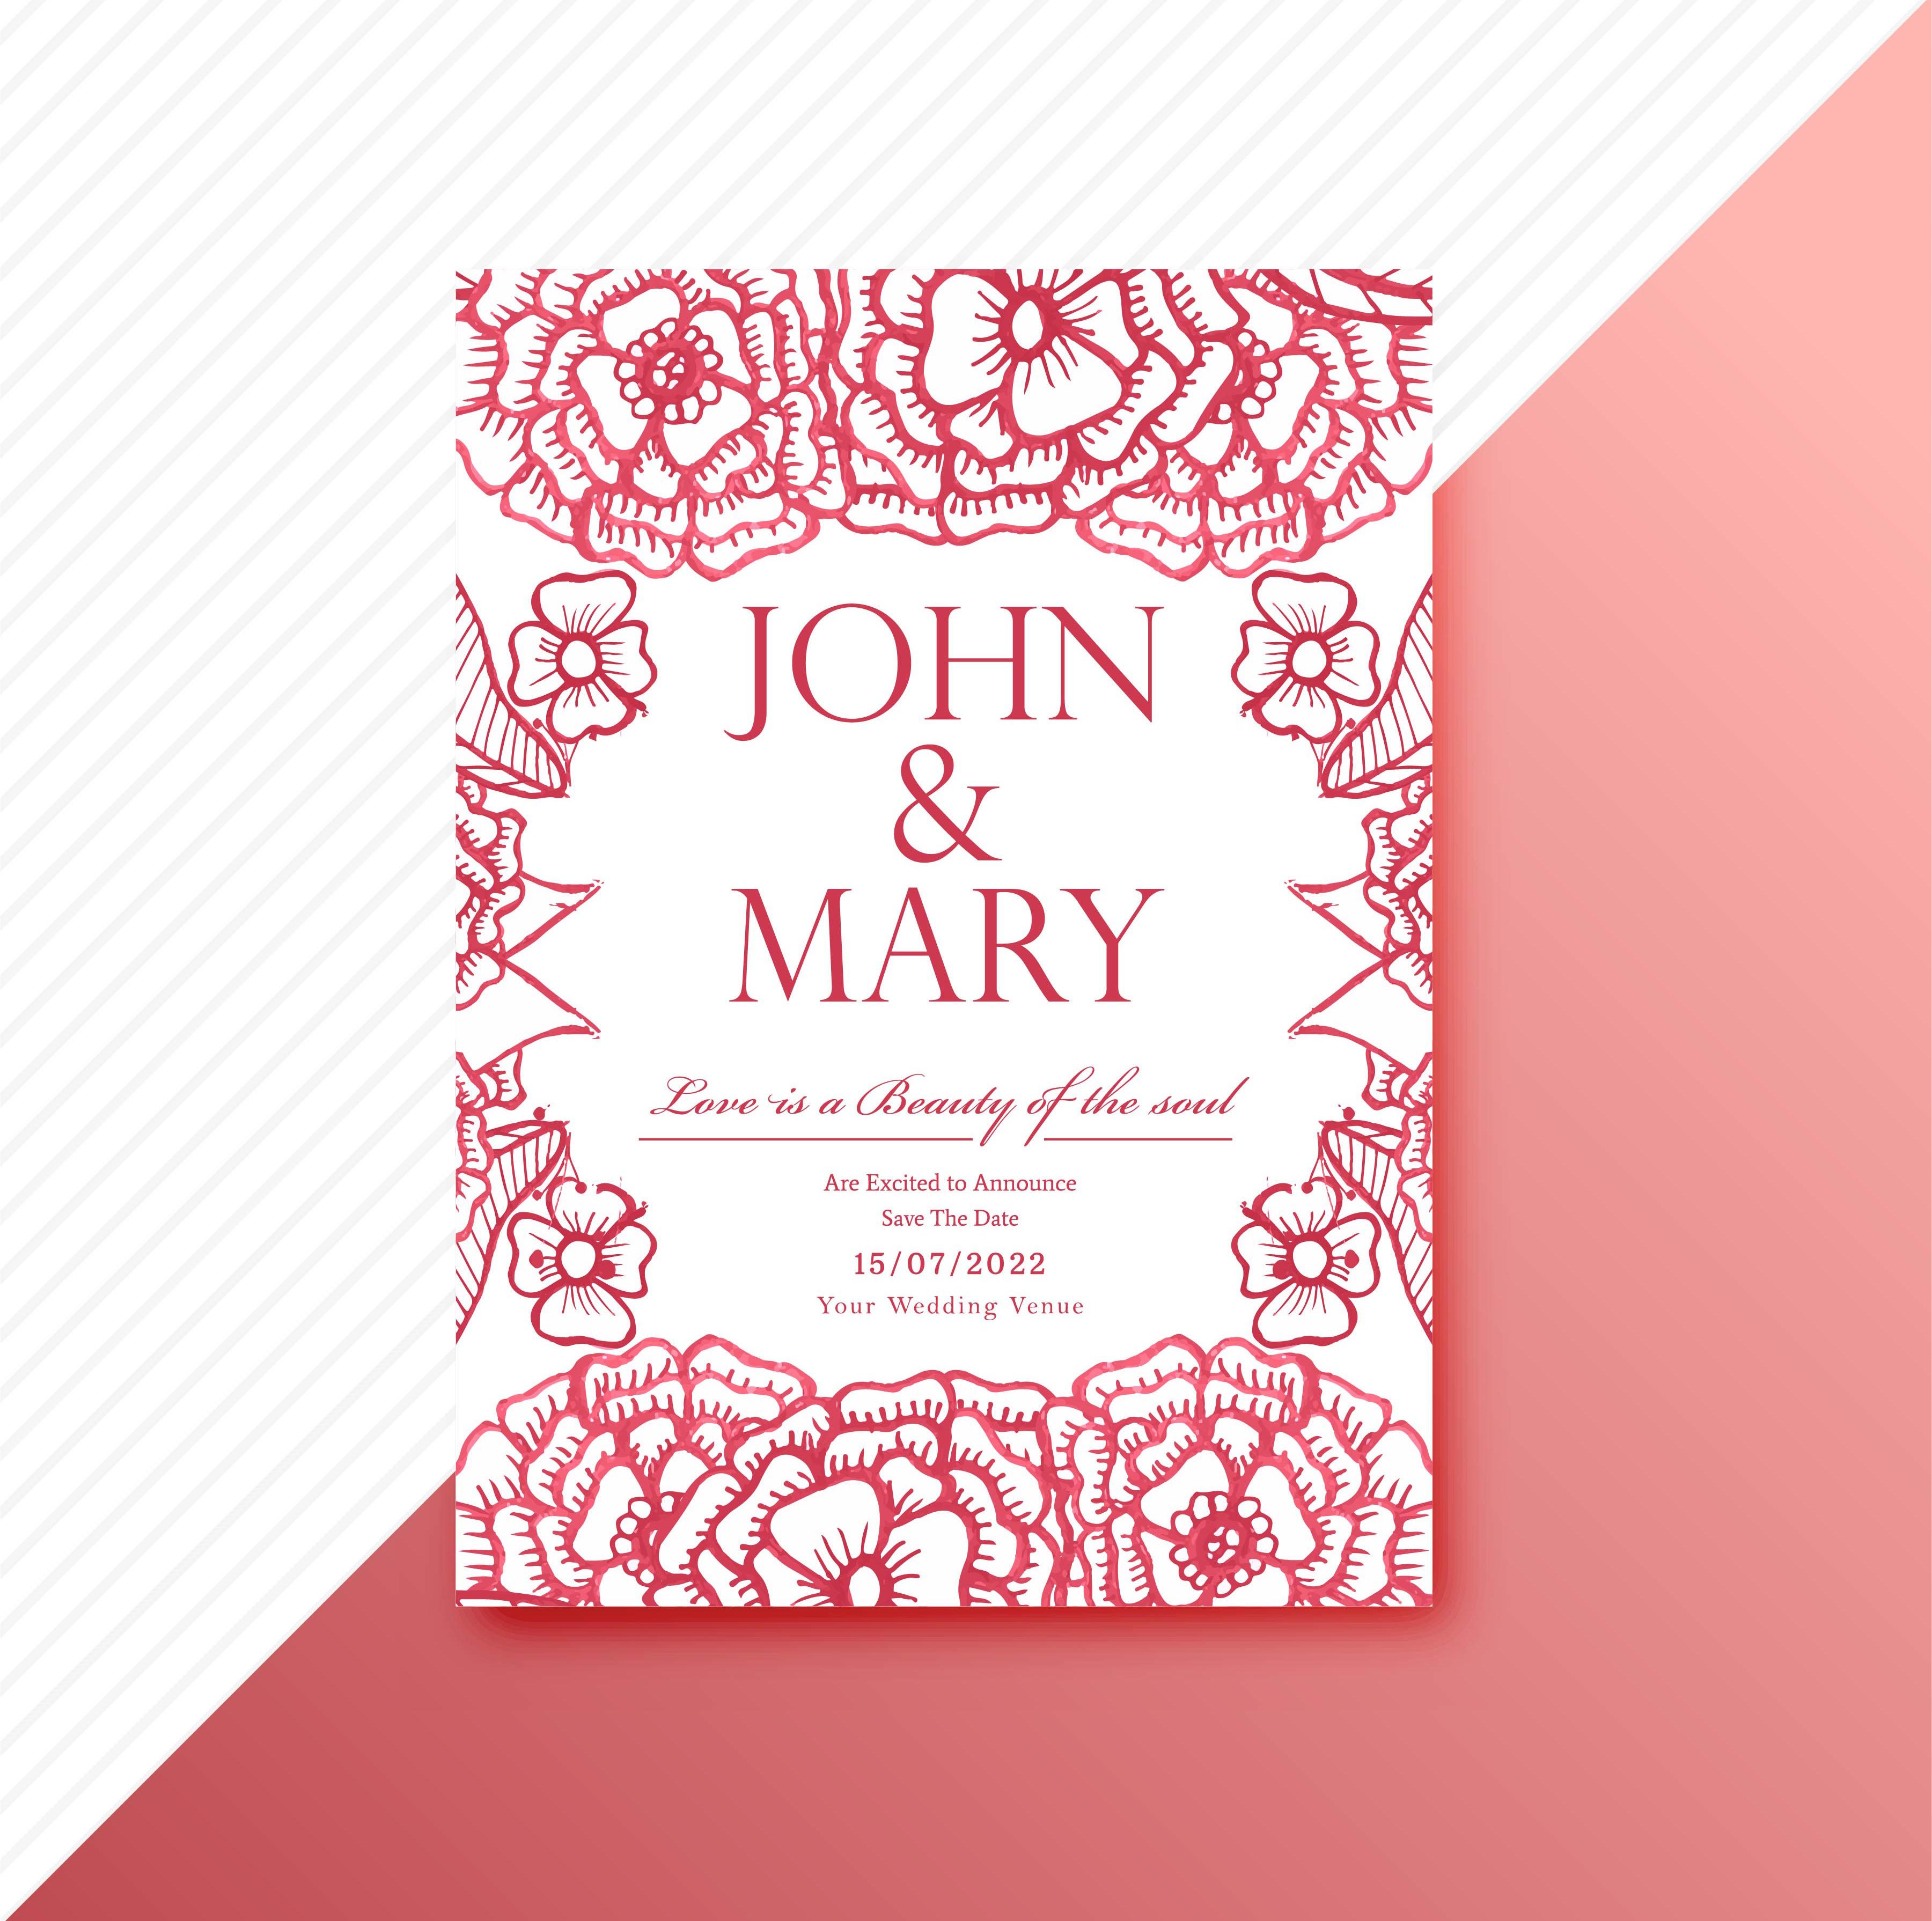 wedding invitation card decorative floral template design